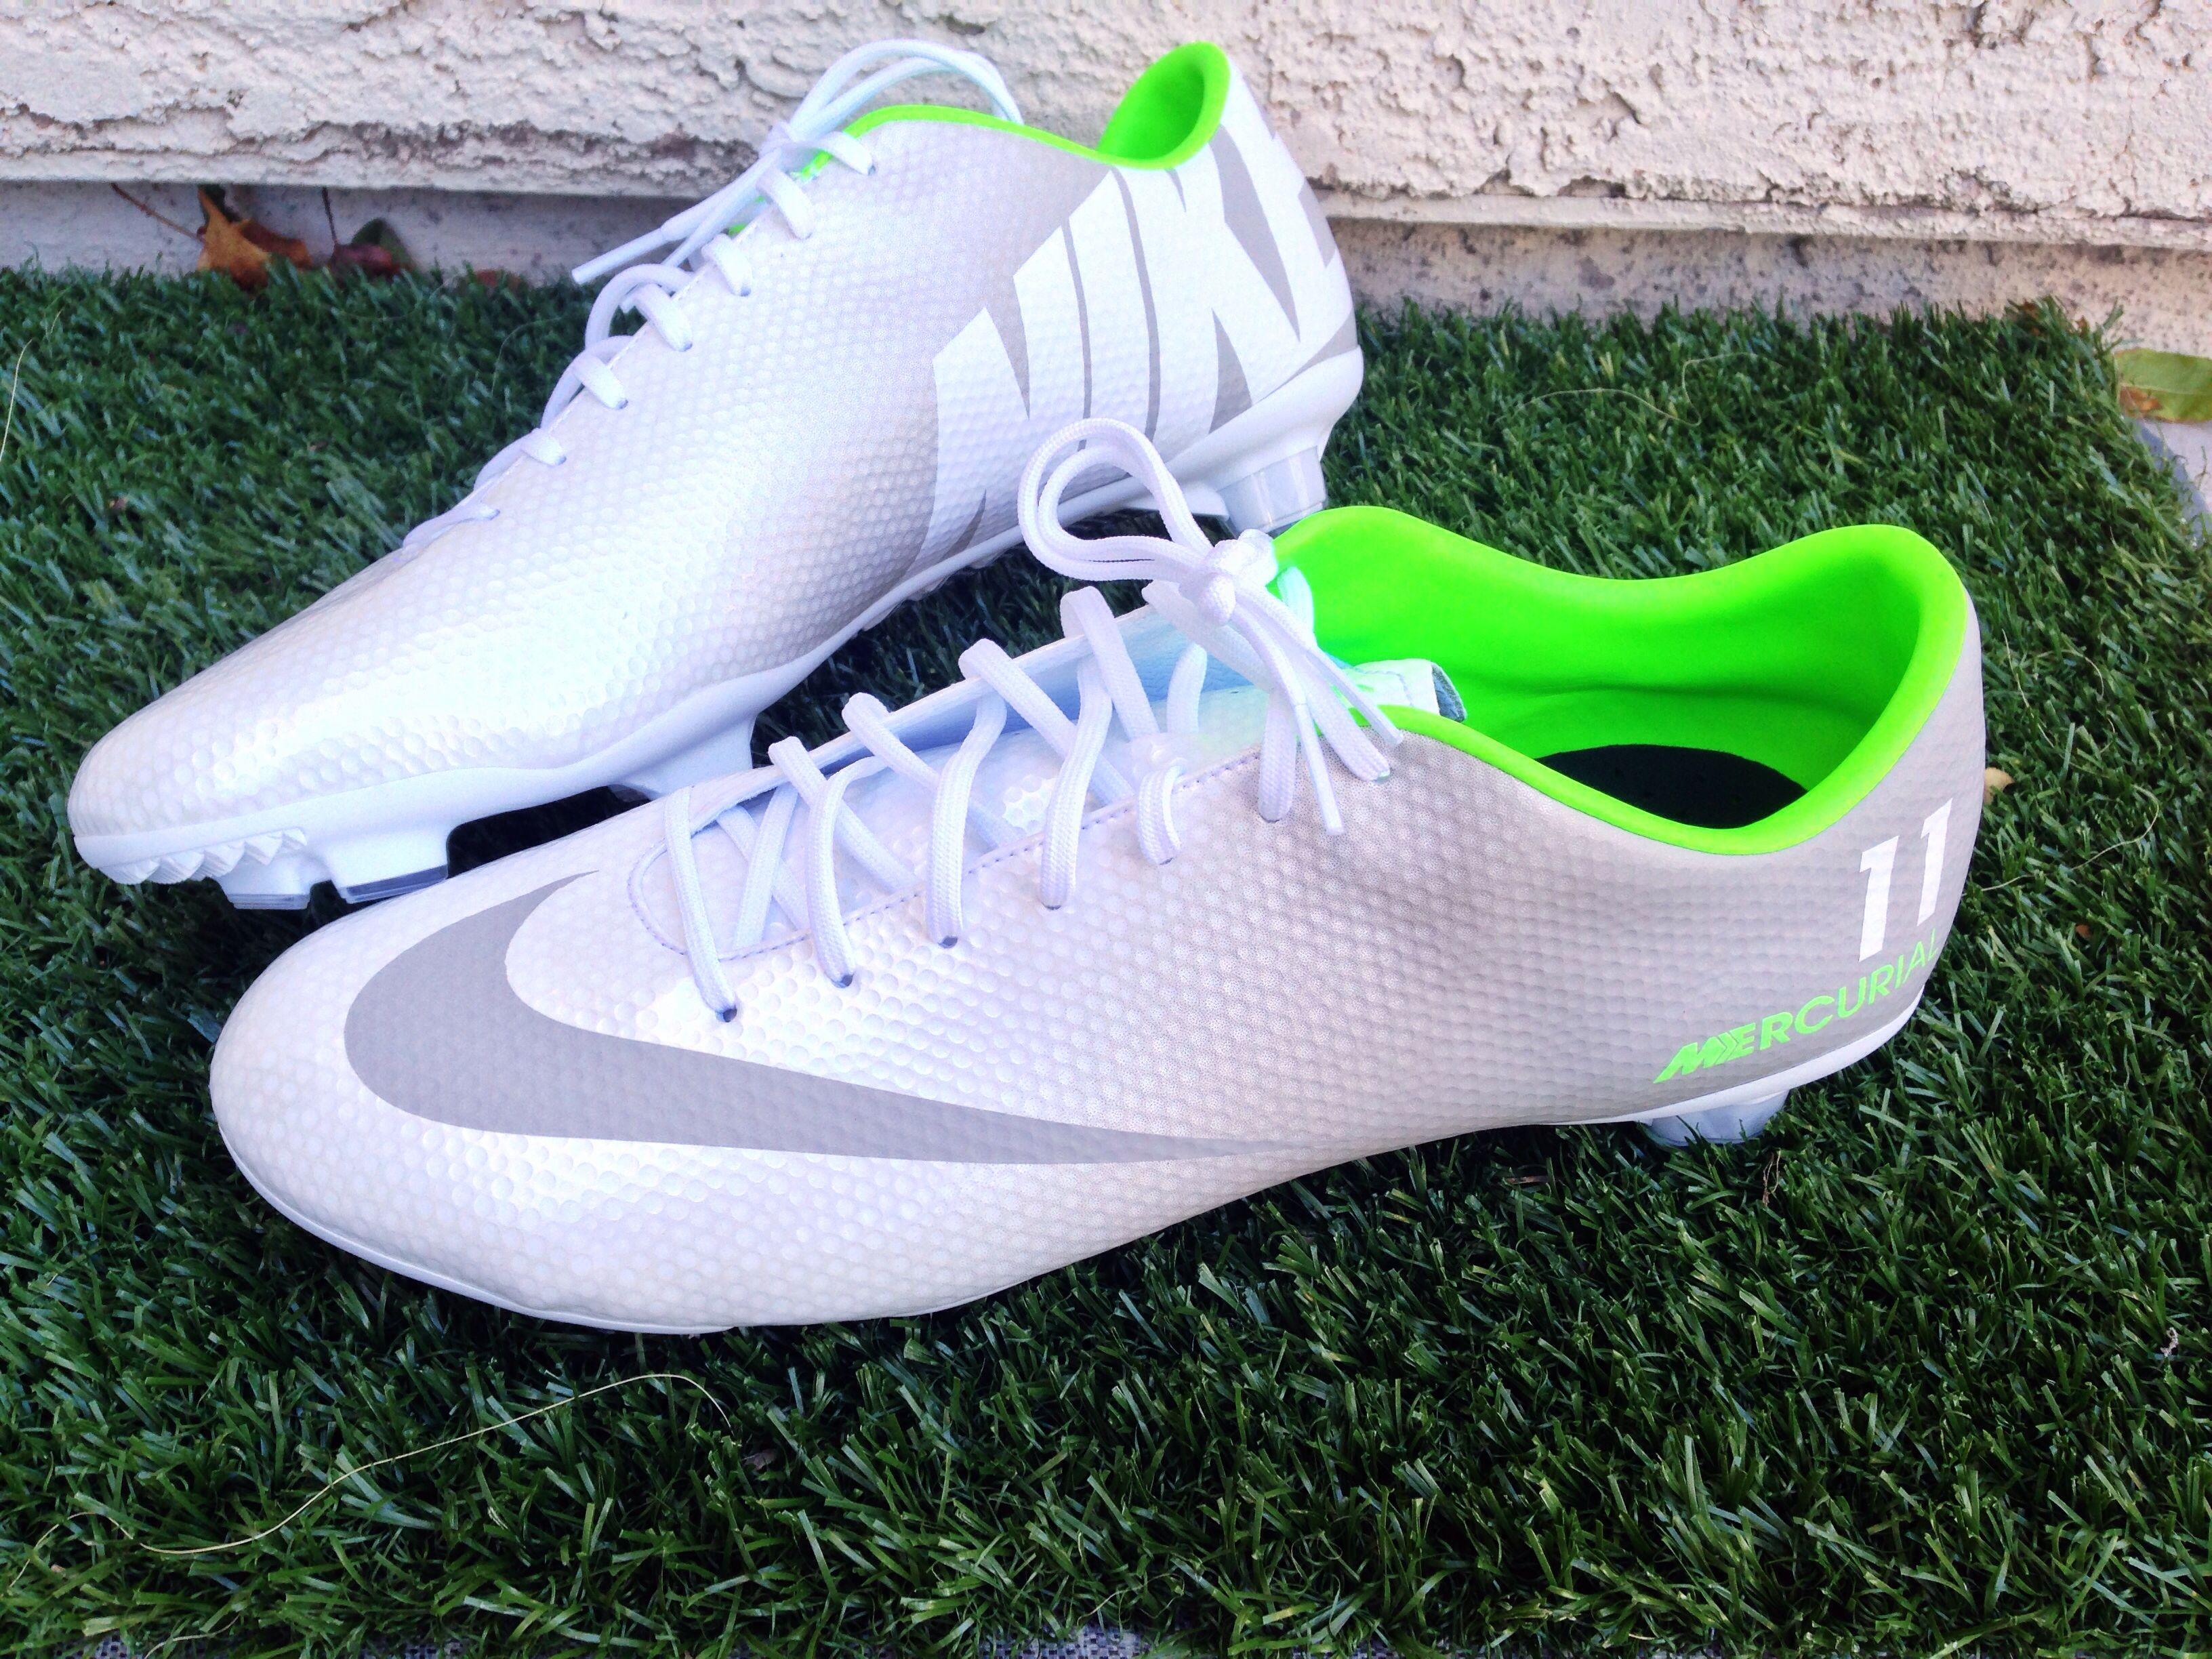 Nike Crampons De Football Identifiant Gris Mercuriel